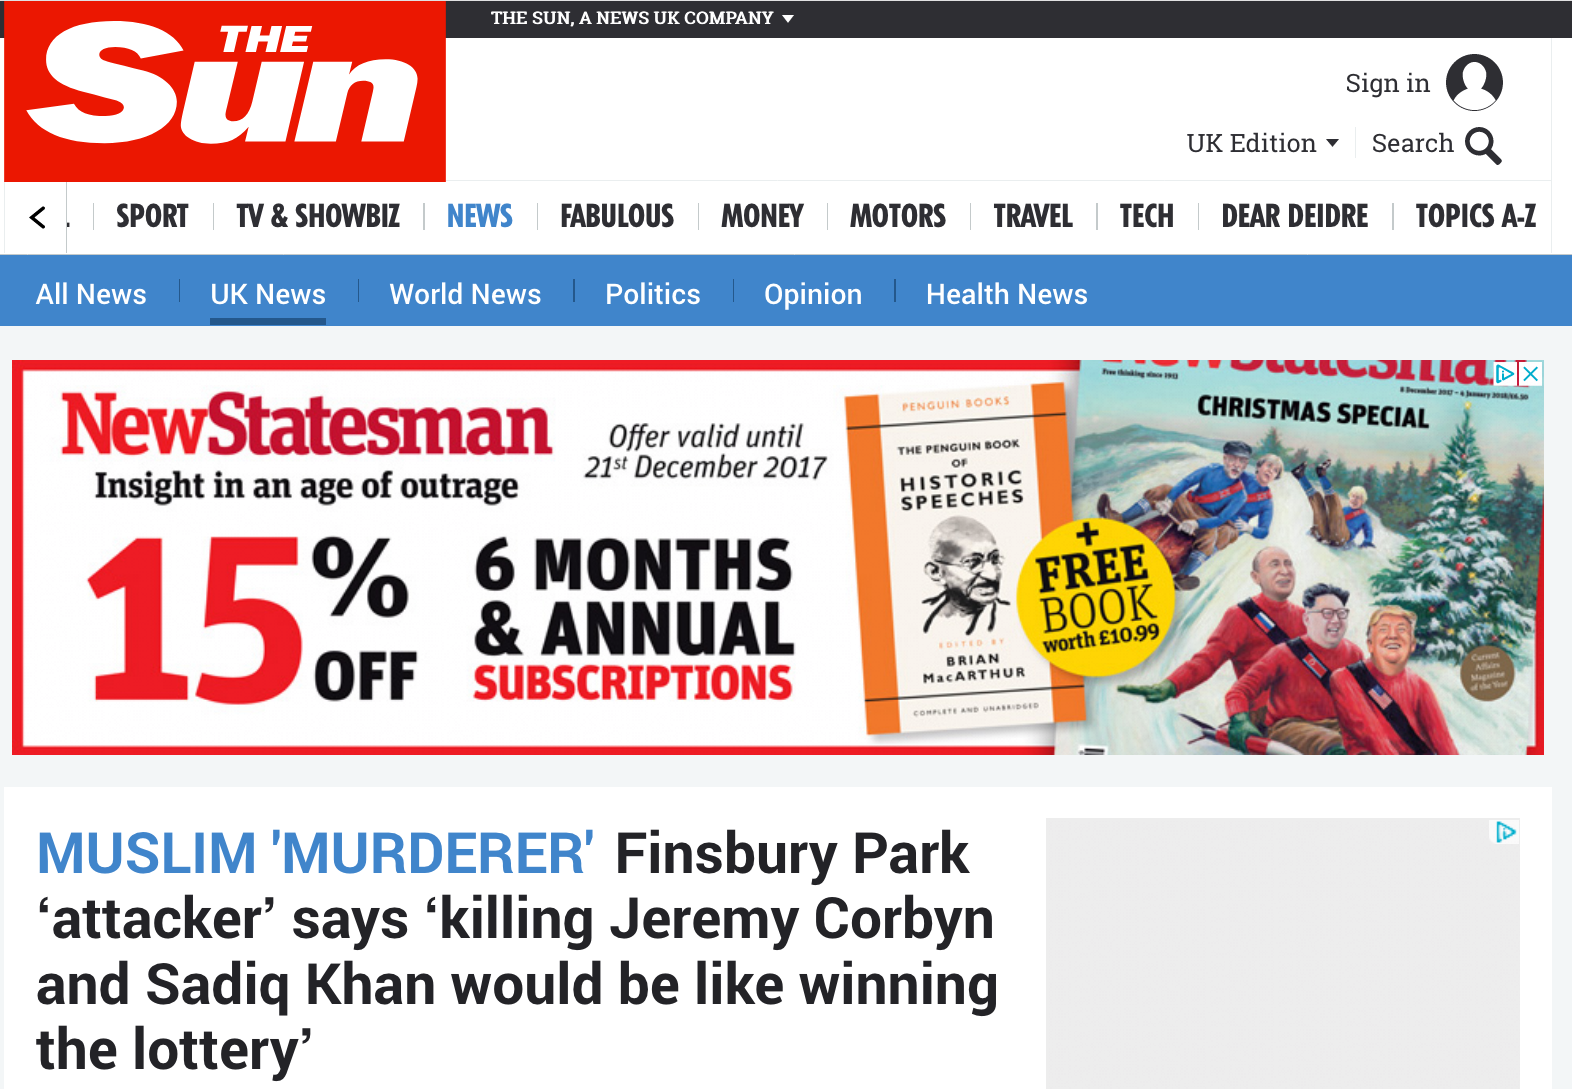 The Sun Headline - Jeremy Corbyn Assassination Plot